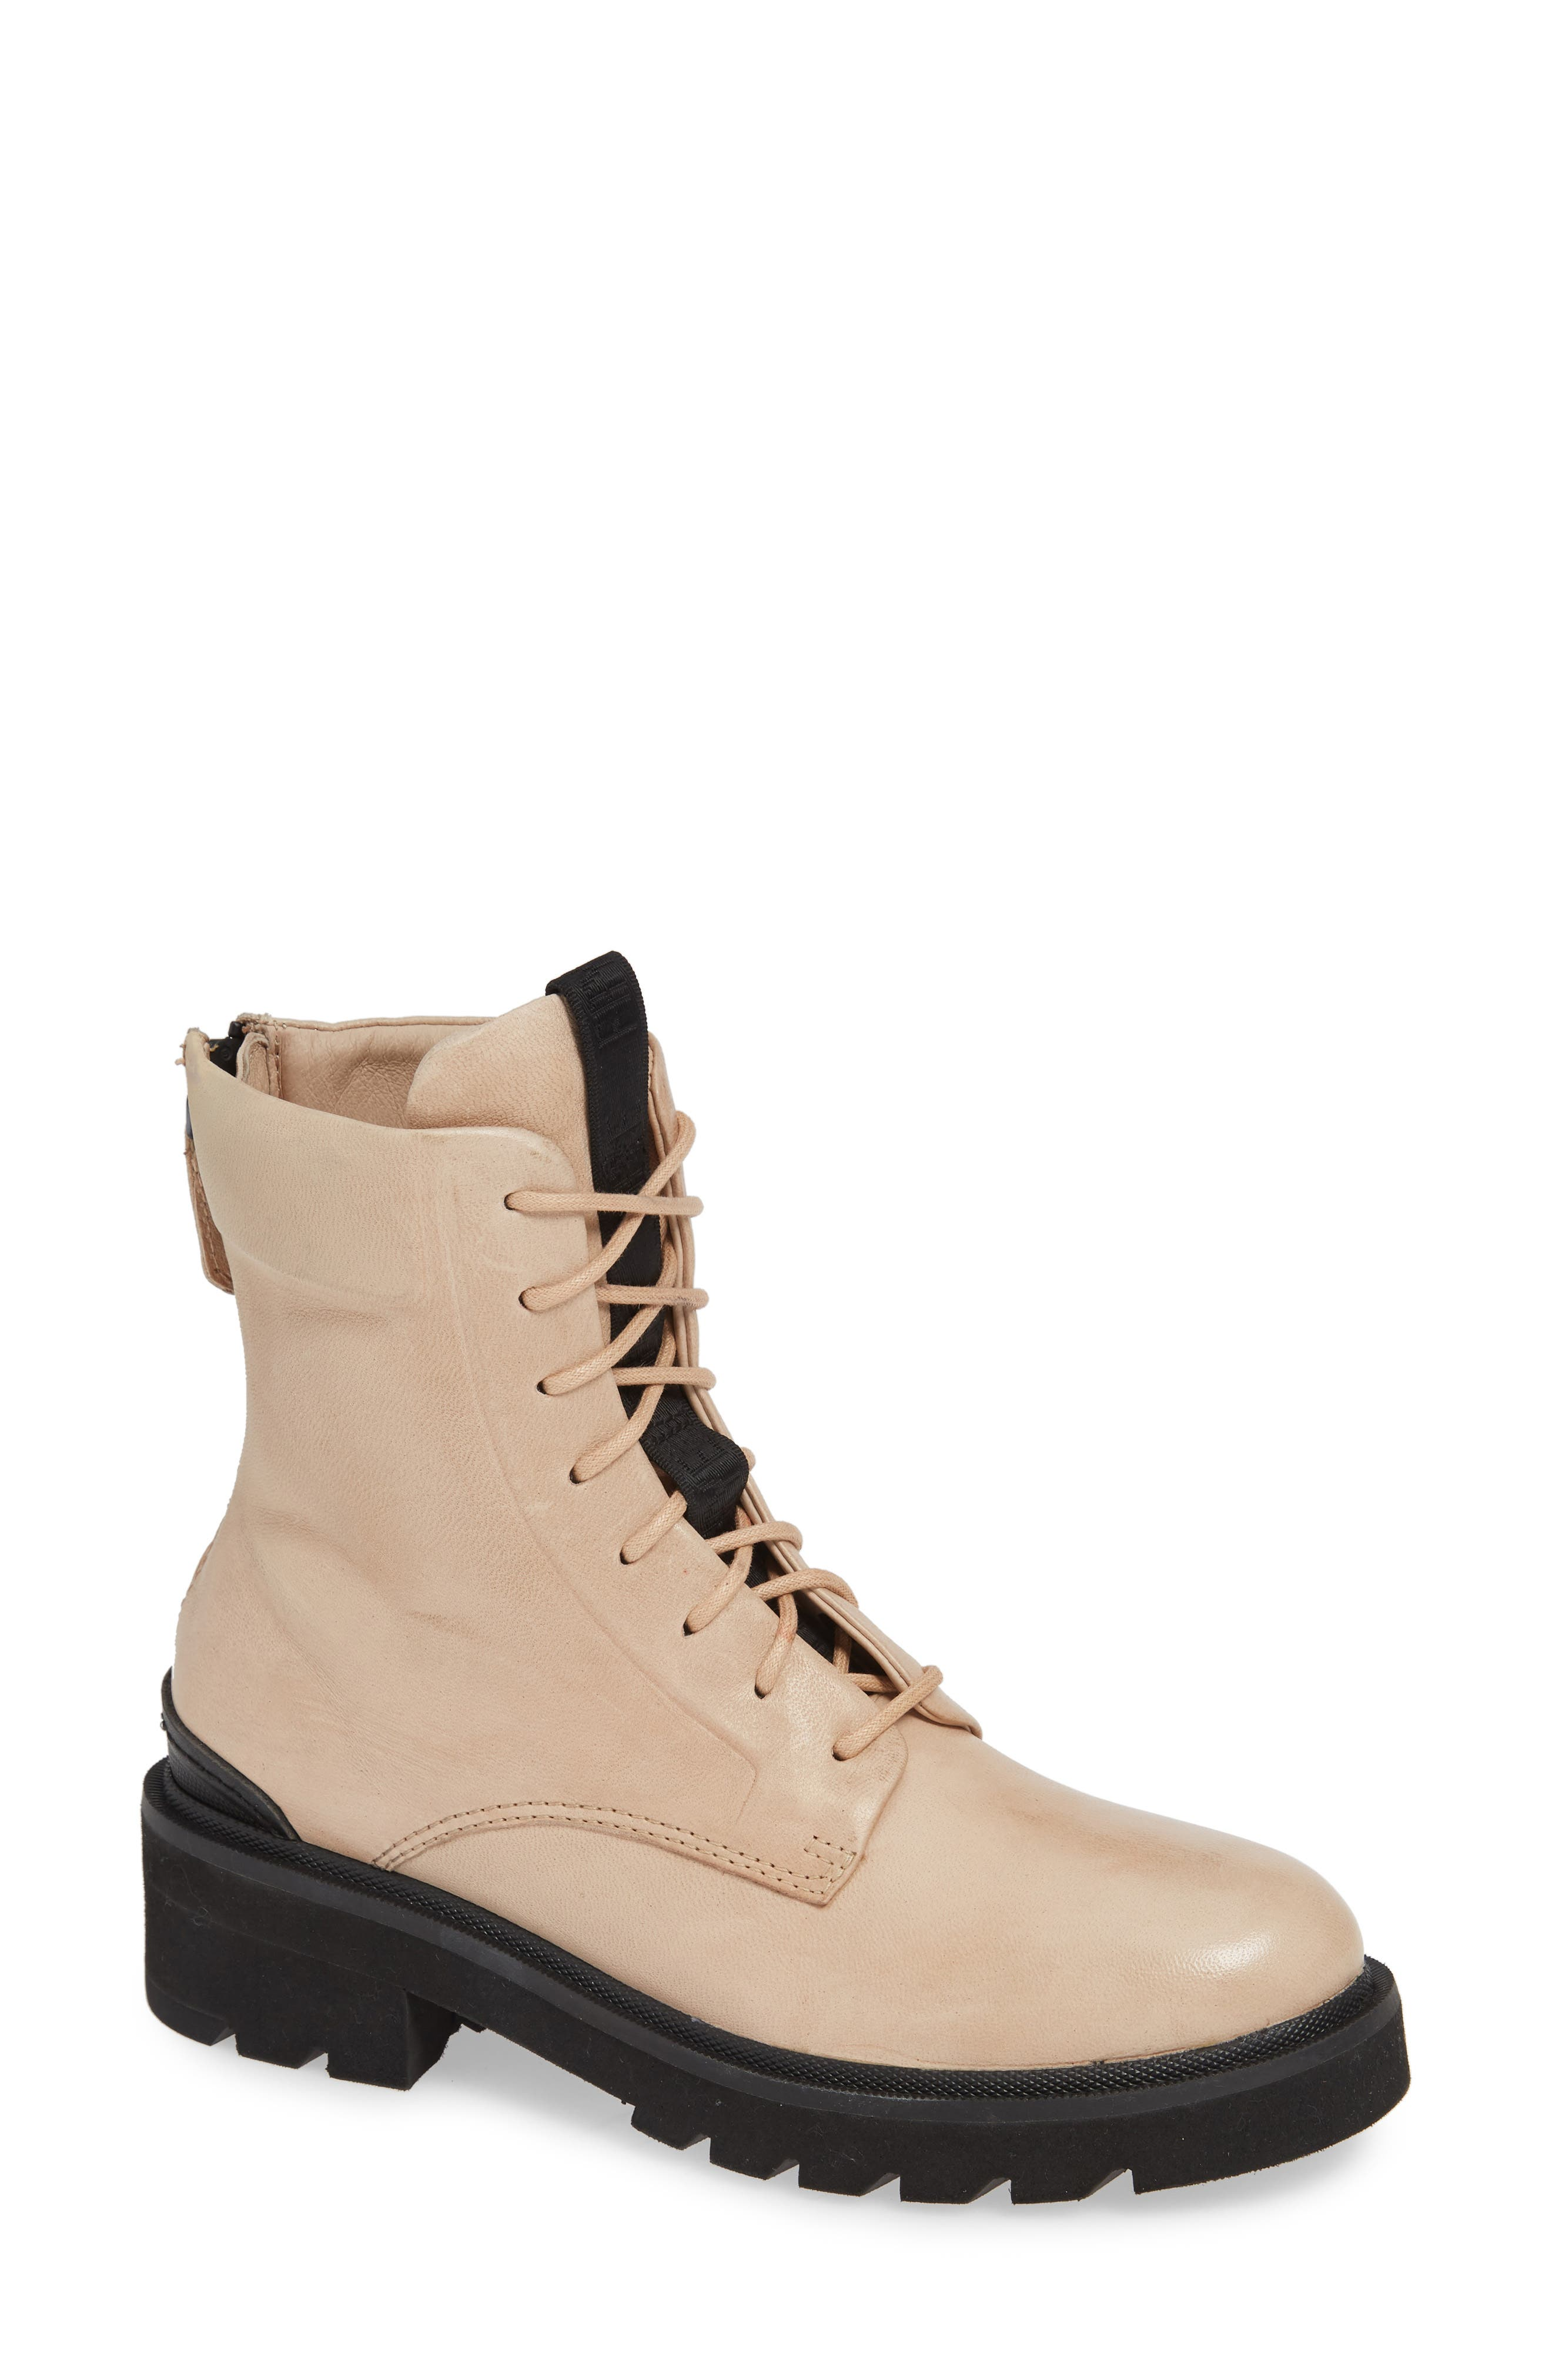 Frye Allison Combat Boot, Ivory